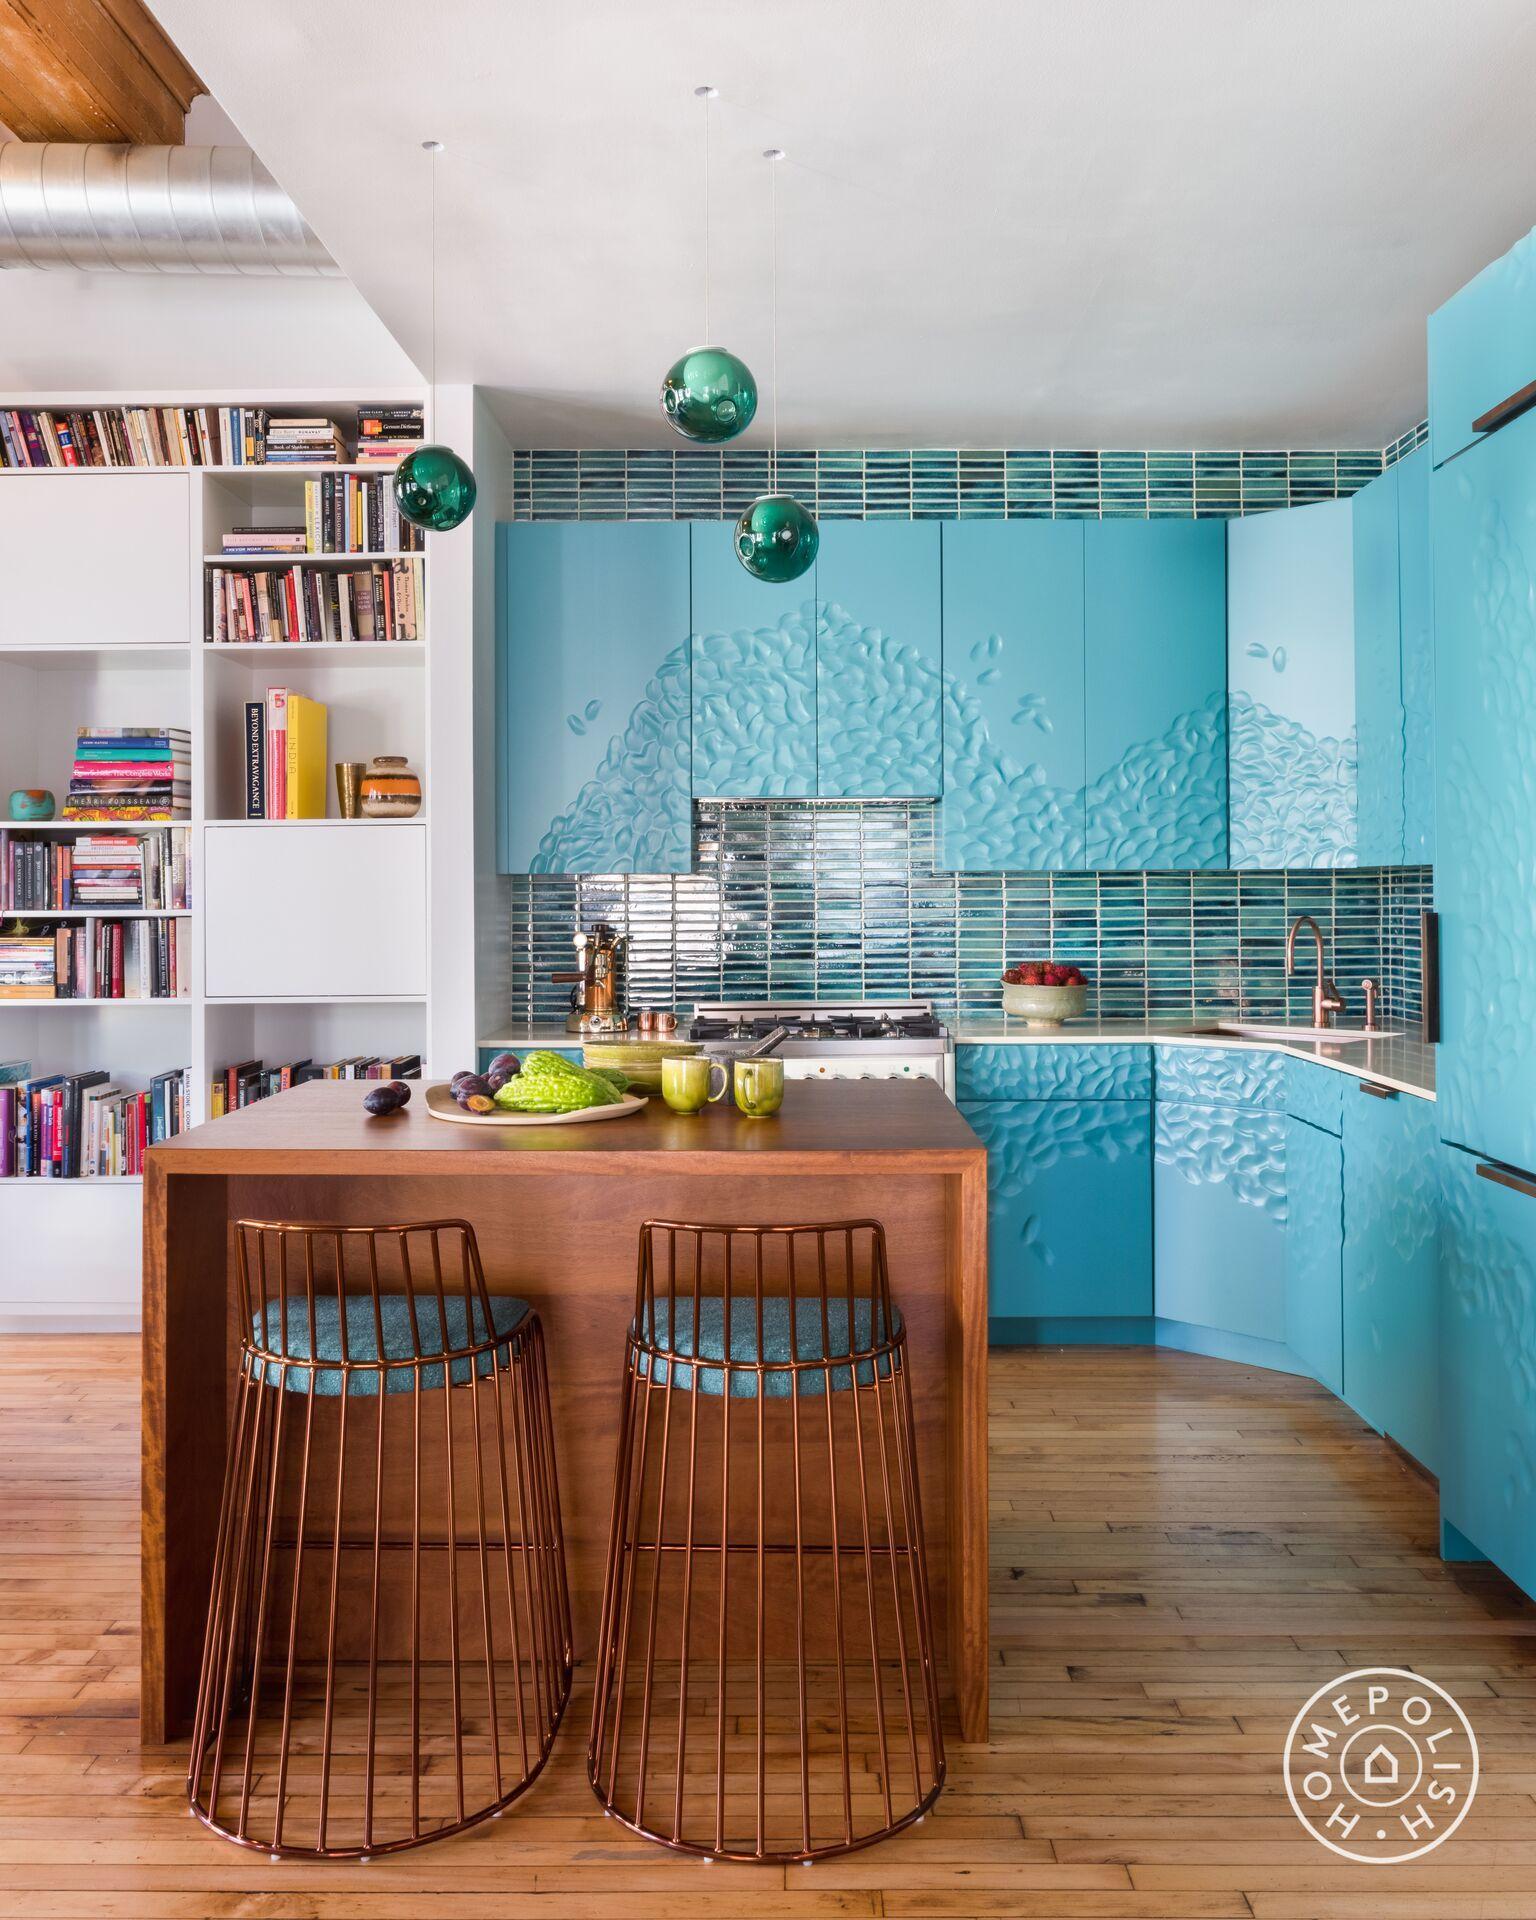 A Surreal Boho Brooklyn Loft | Kitchens, Dream beach houses and Lofts